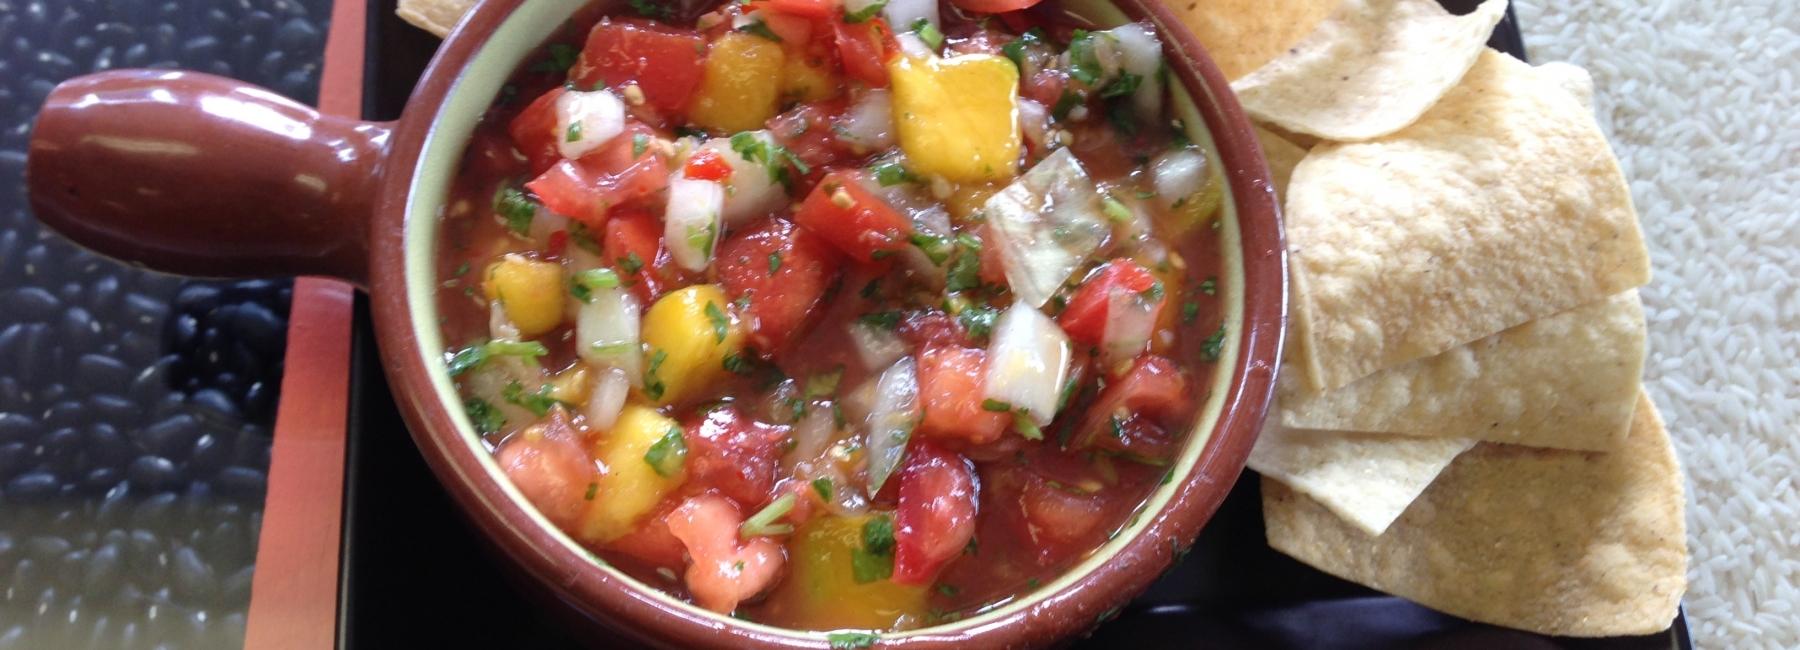 Paprika-mango salsa